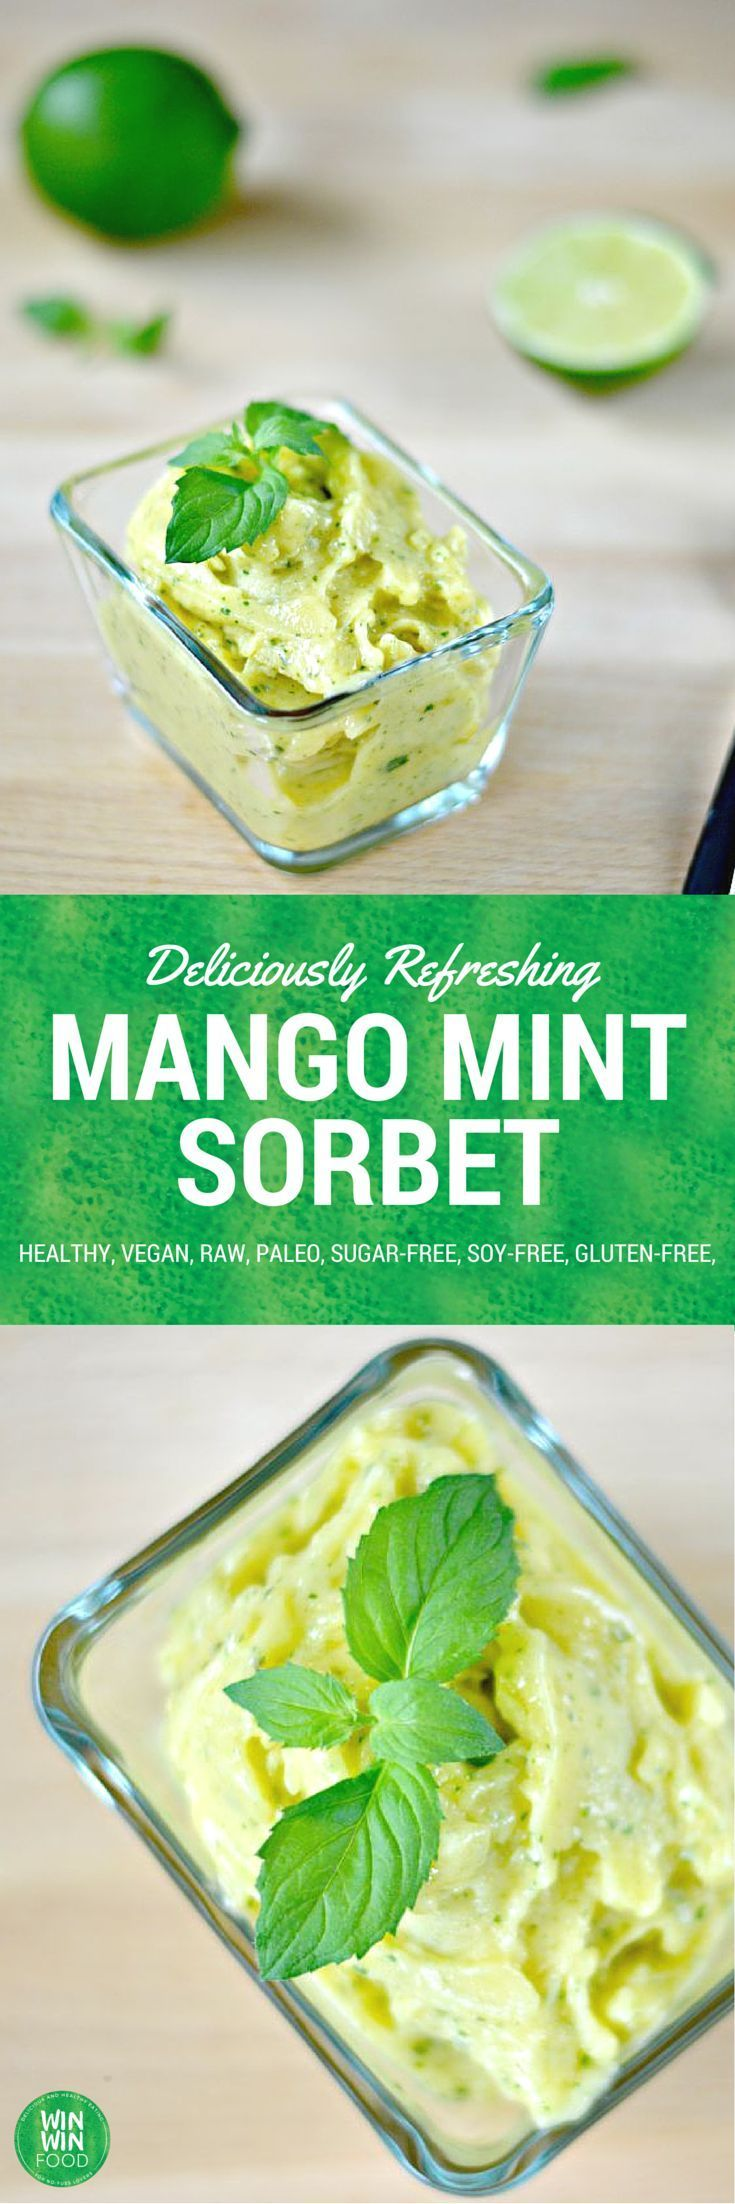 Mango Sorbet auf Pinterest | Sorbet, Limetten-sorbet und Mango